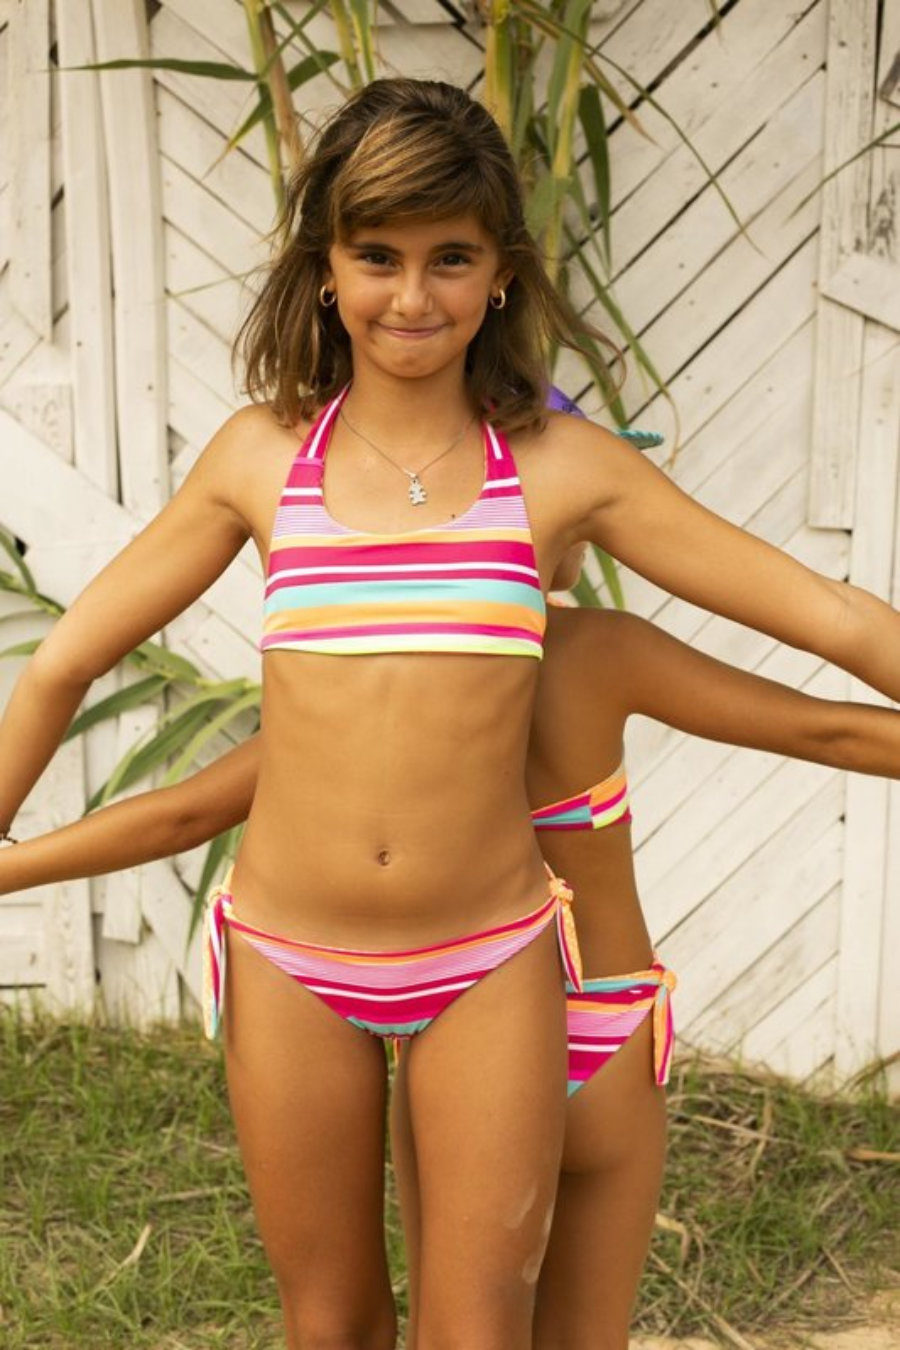 Stripy girl bikini